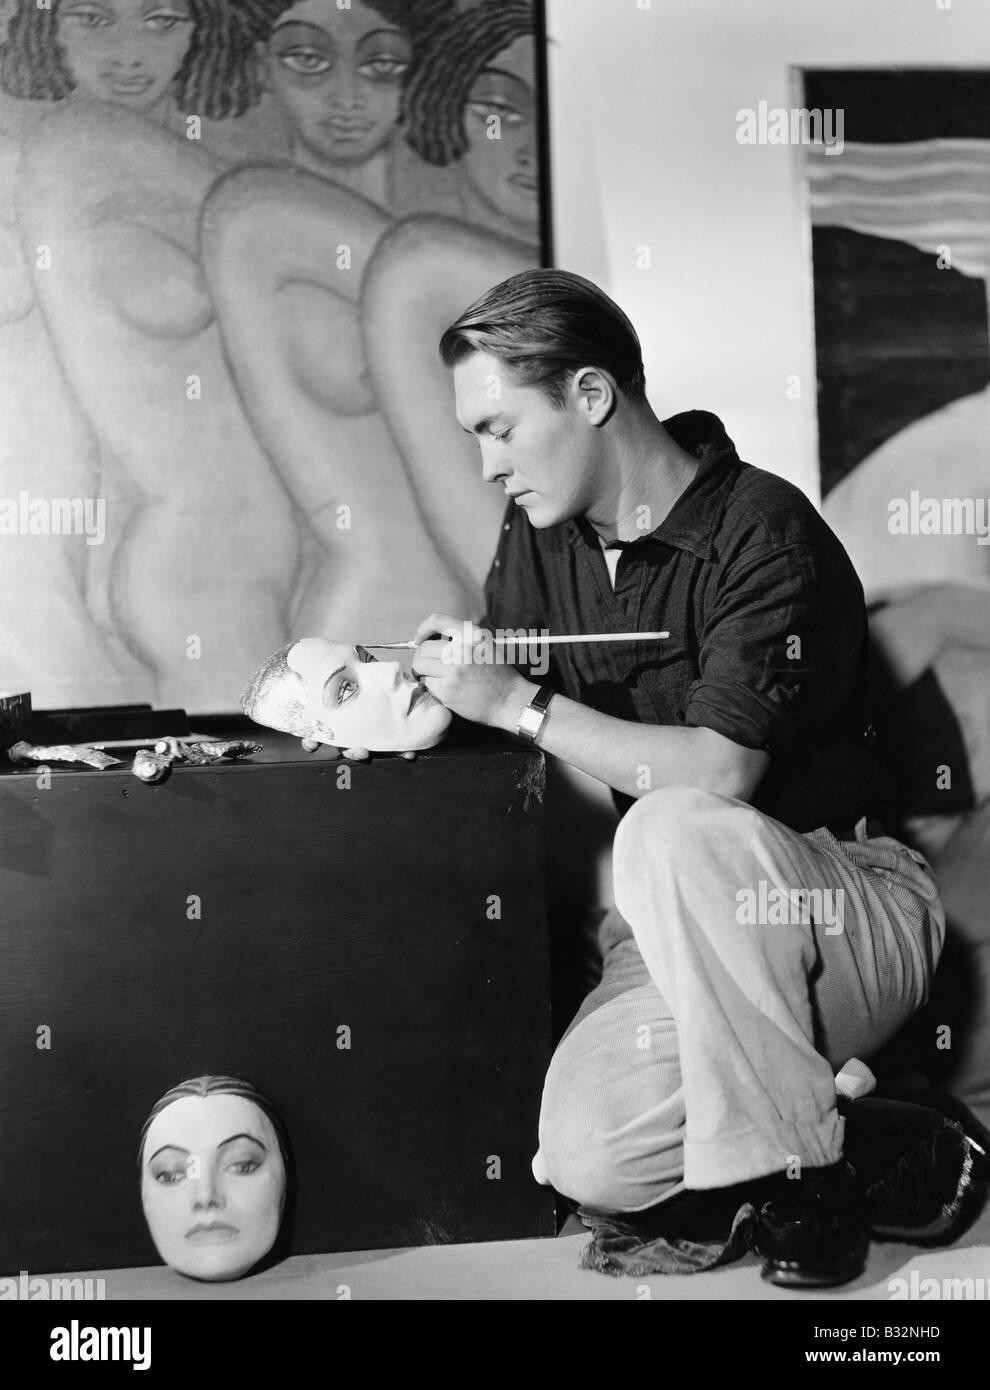 Hombre máscaras de pintura Imagen De Stock